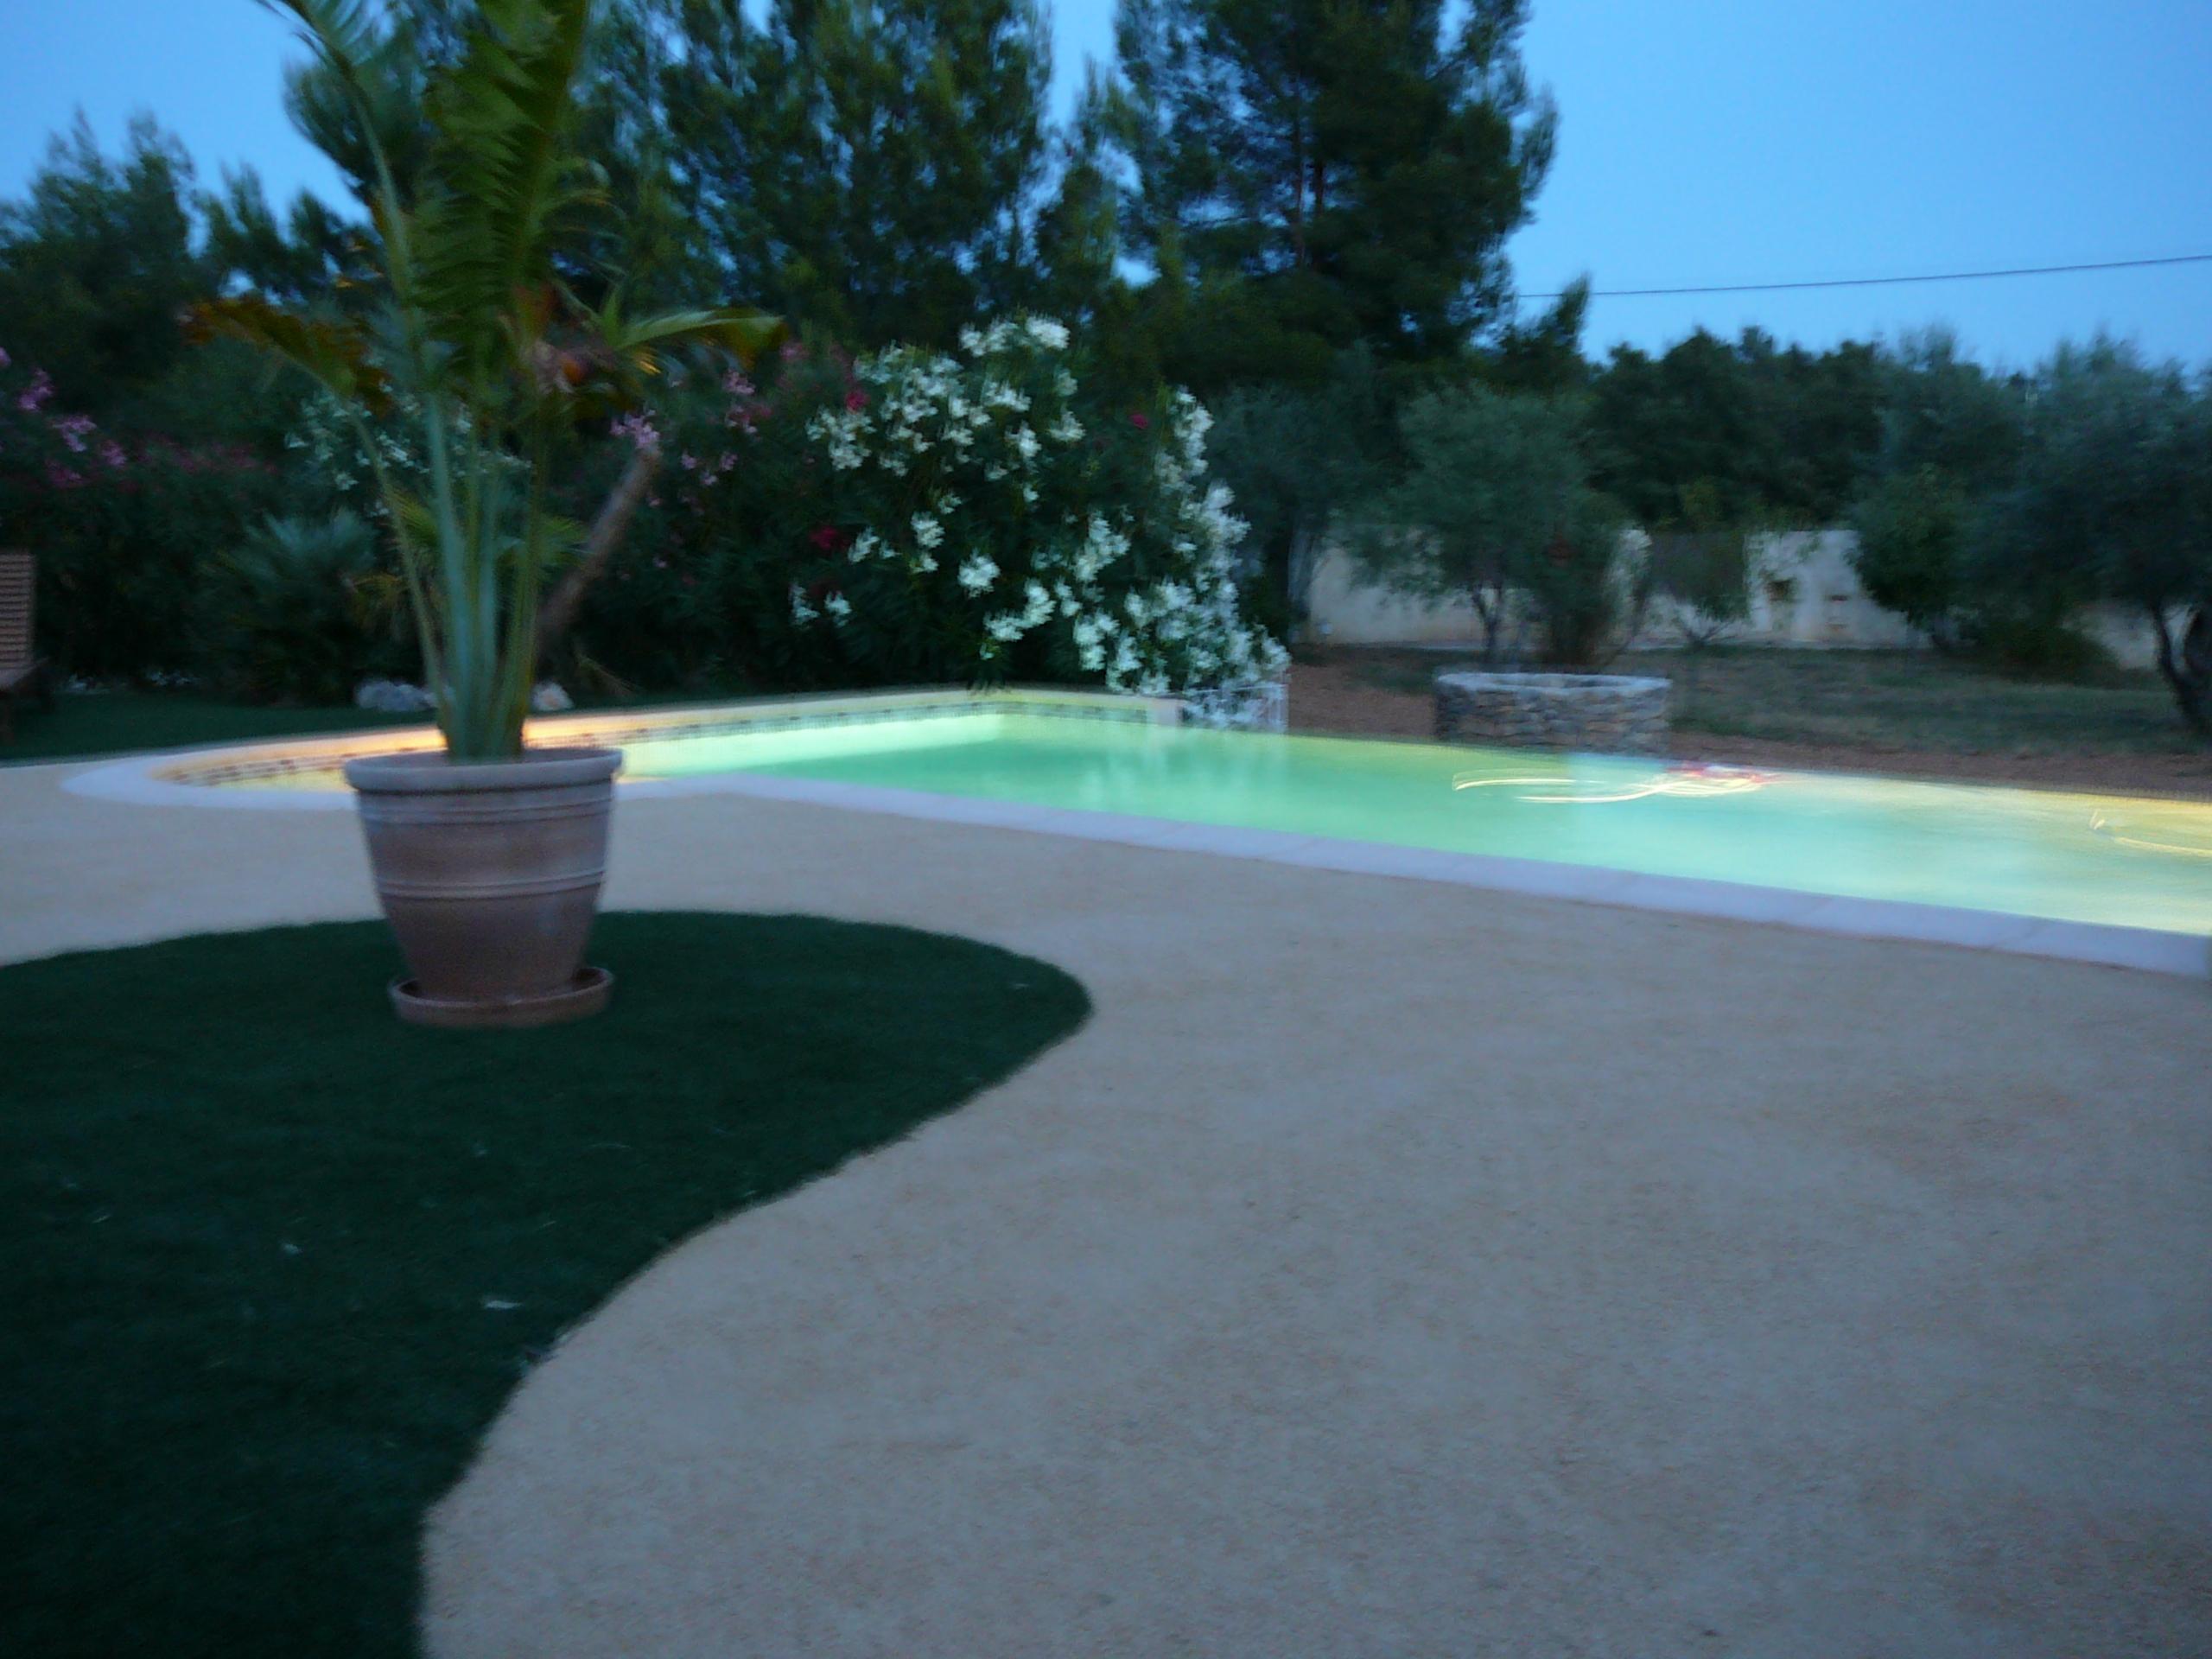 Maison de caractere piscine a debordement 9 x 4 for Sims 4 piscine a debordement